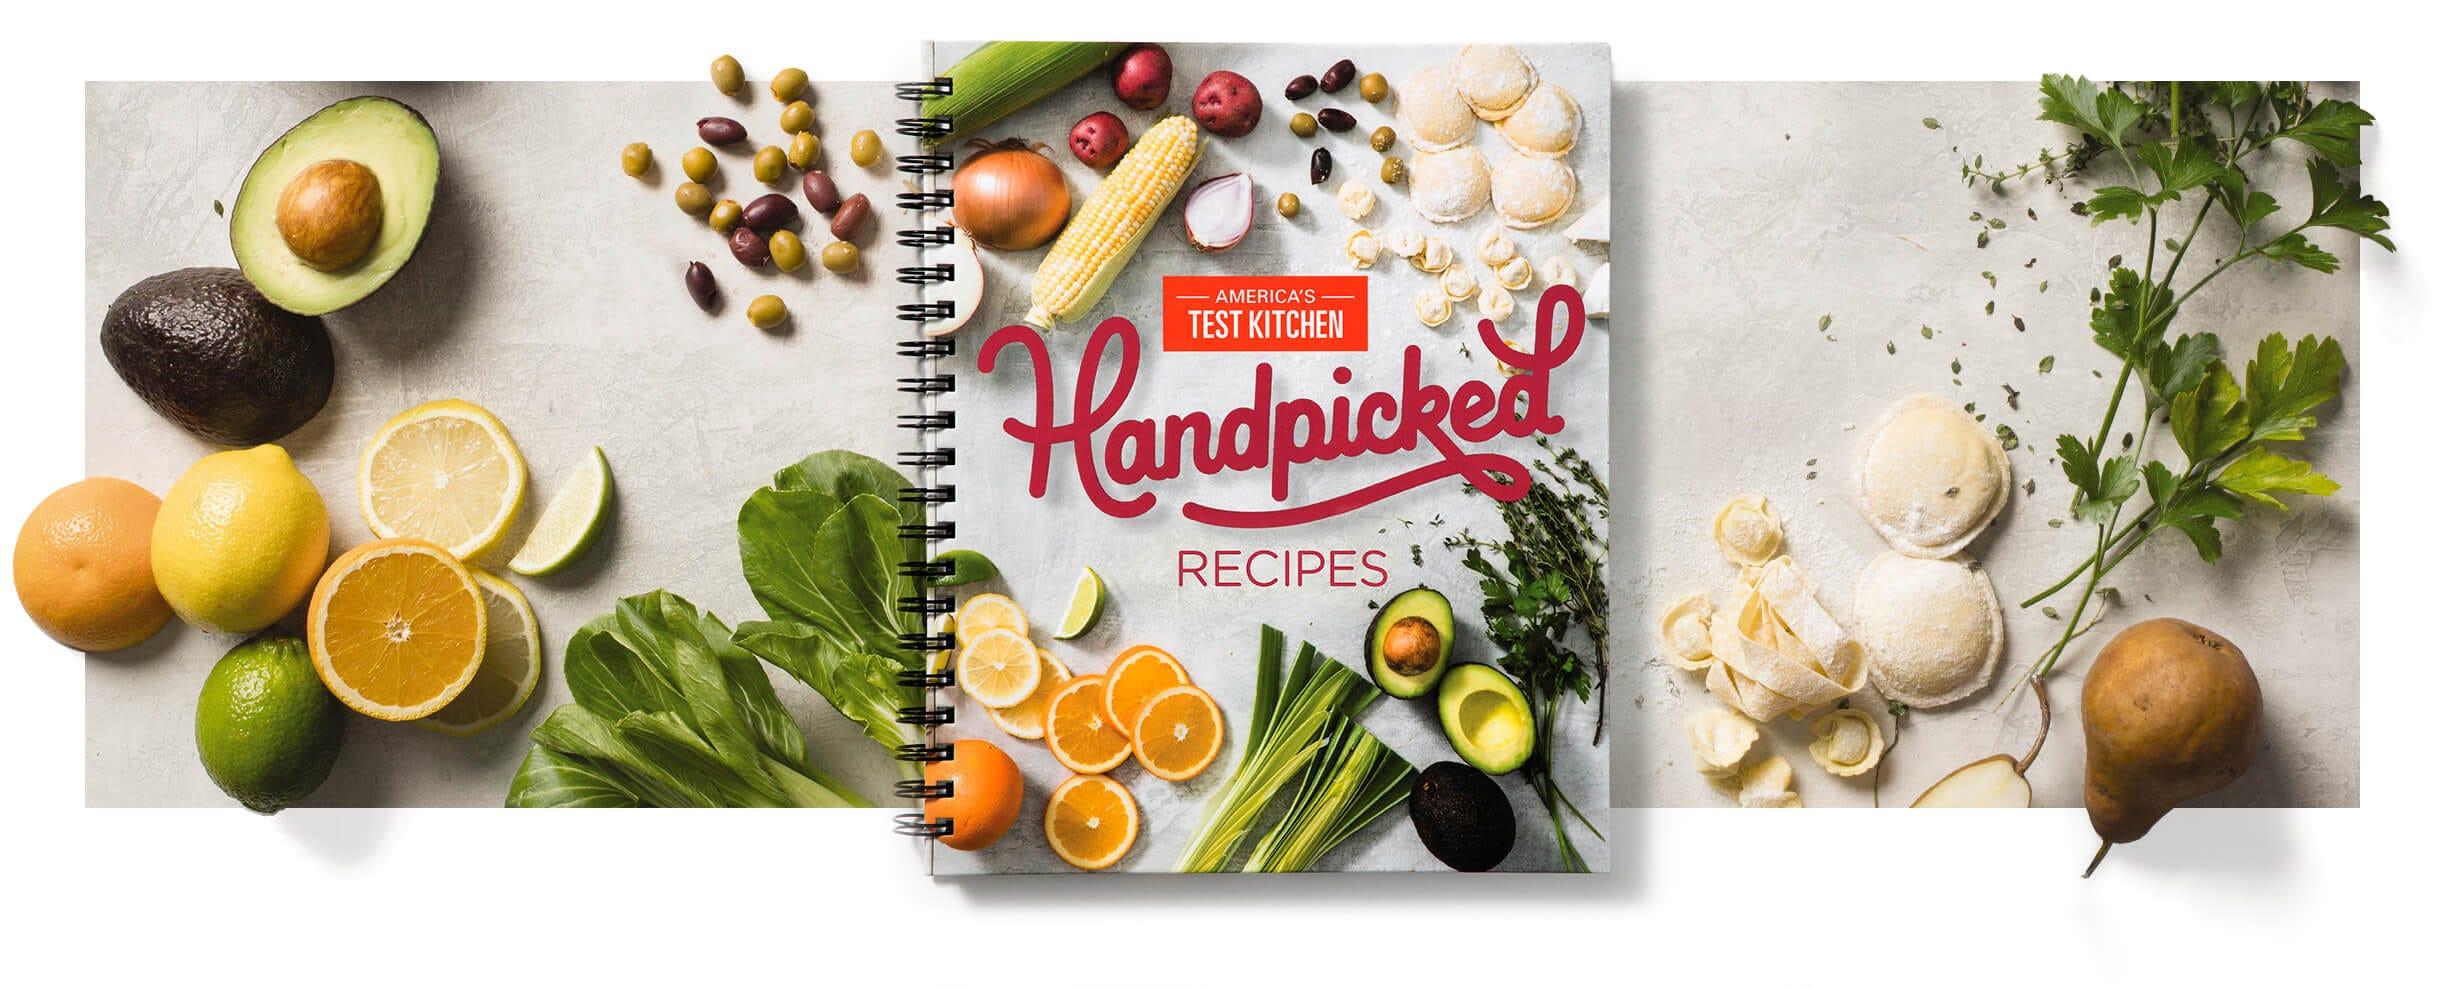 Handpicked Recipes Image